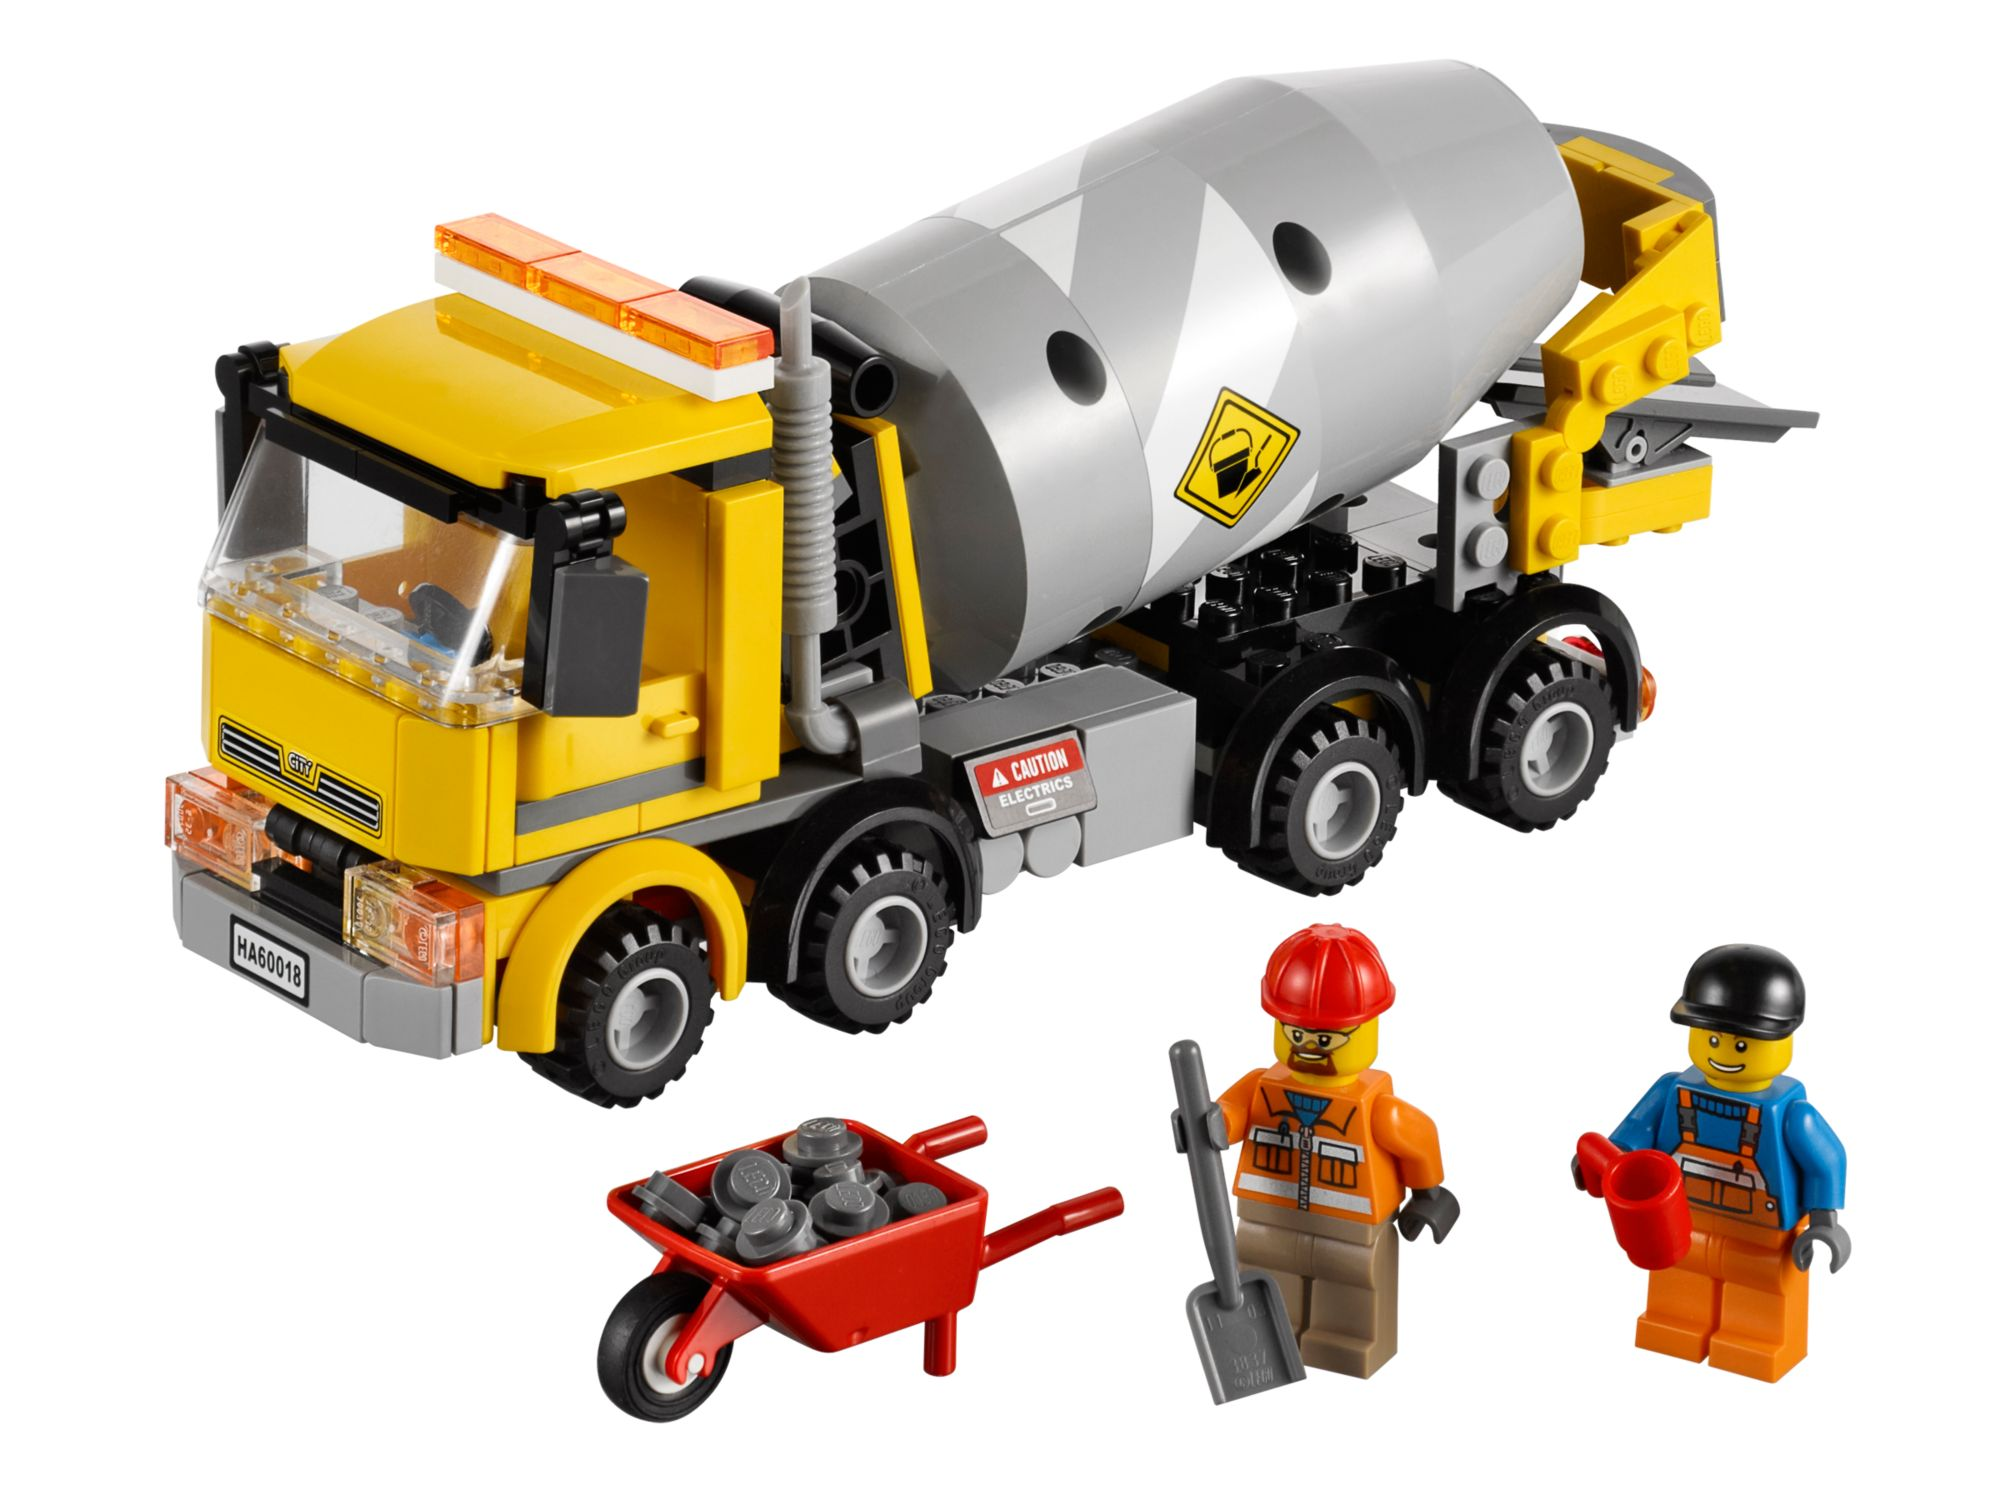 Лего Сити 60018 Бетономешалка инструкция, обзор, картинки и видео ...